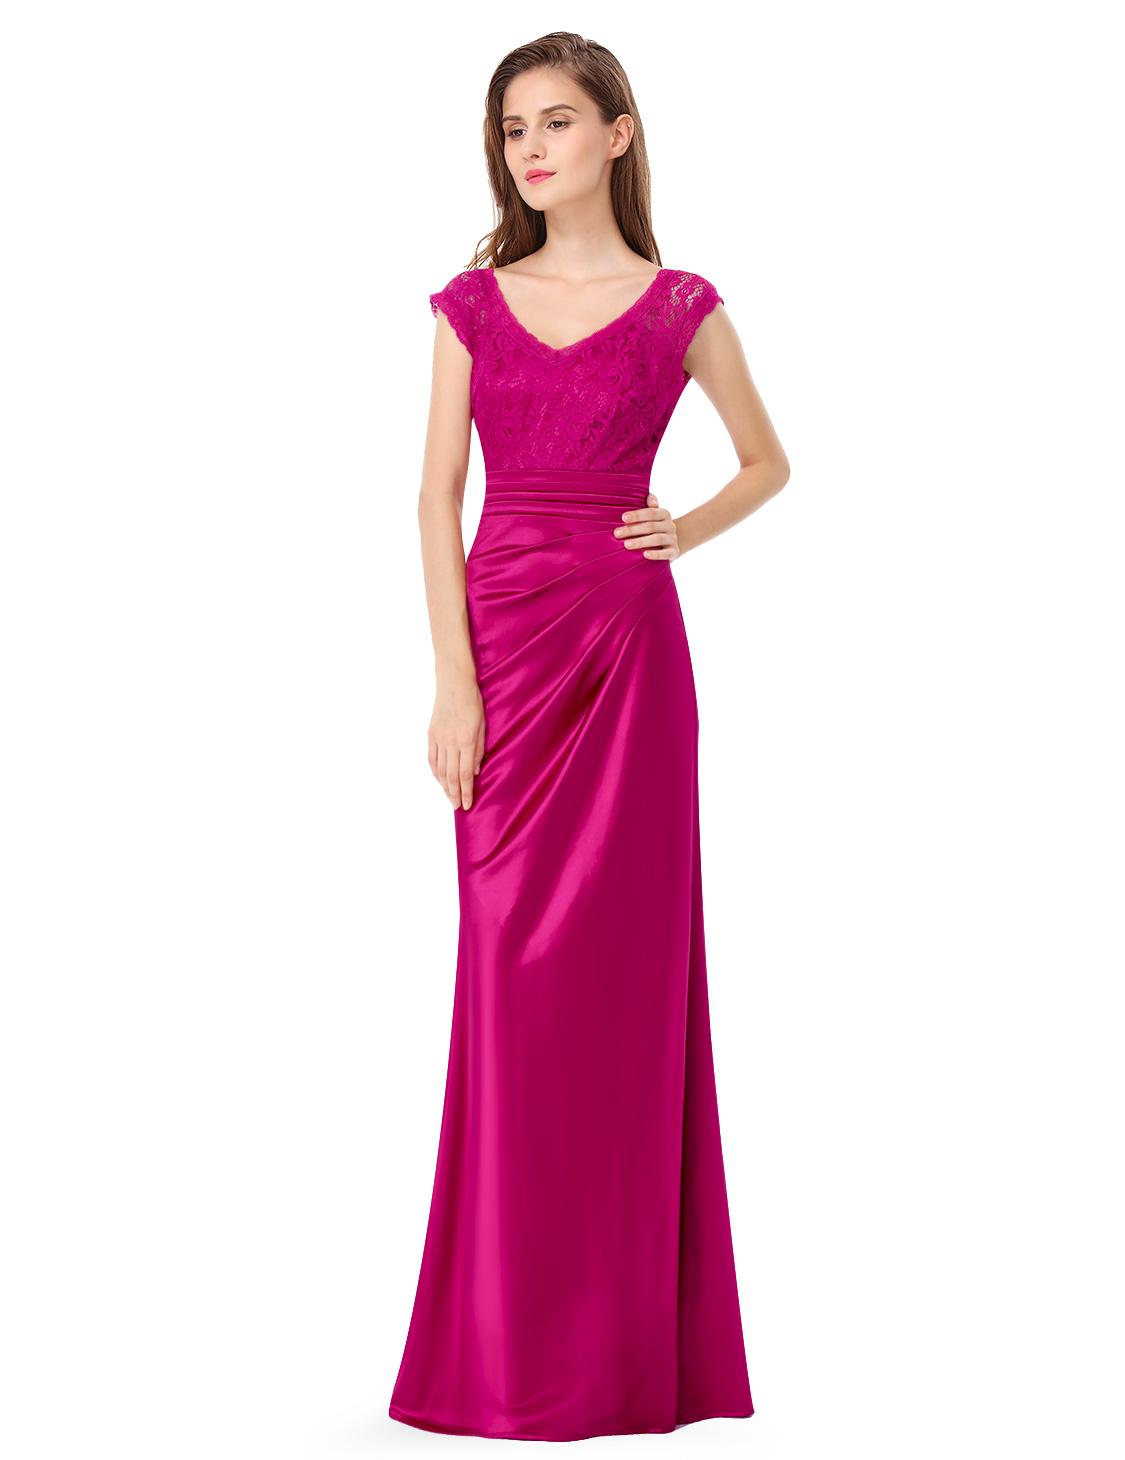 Womens hot pink bridesmaid dresses v neck formal evening prom ball womens hot pink bridesmaid dresses v neck formal ombrellifo Image collections